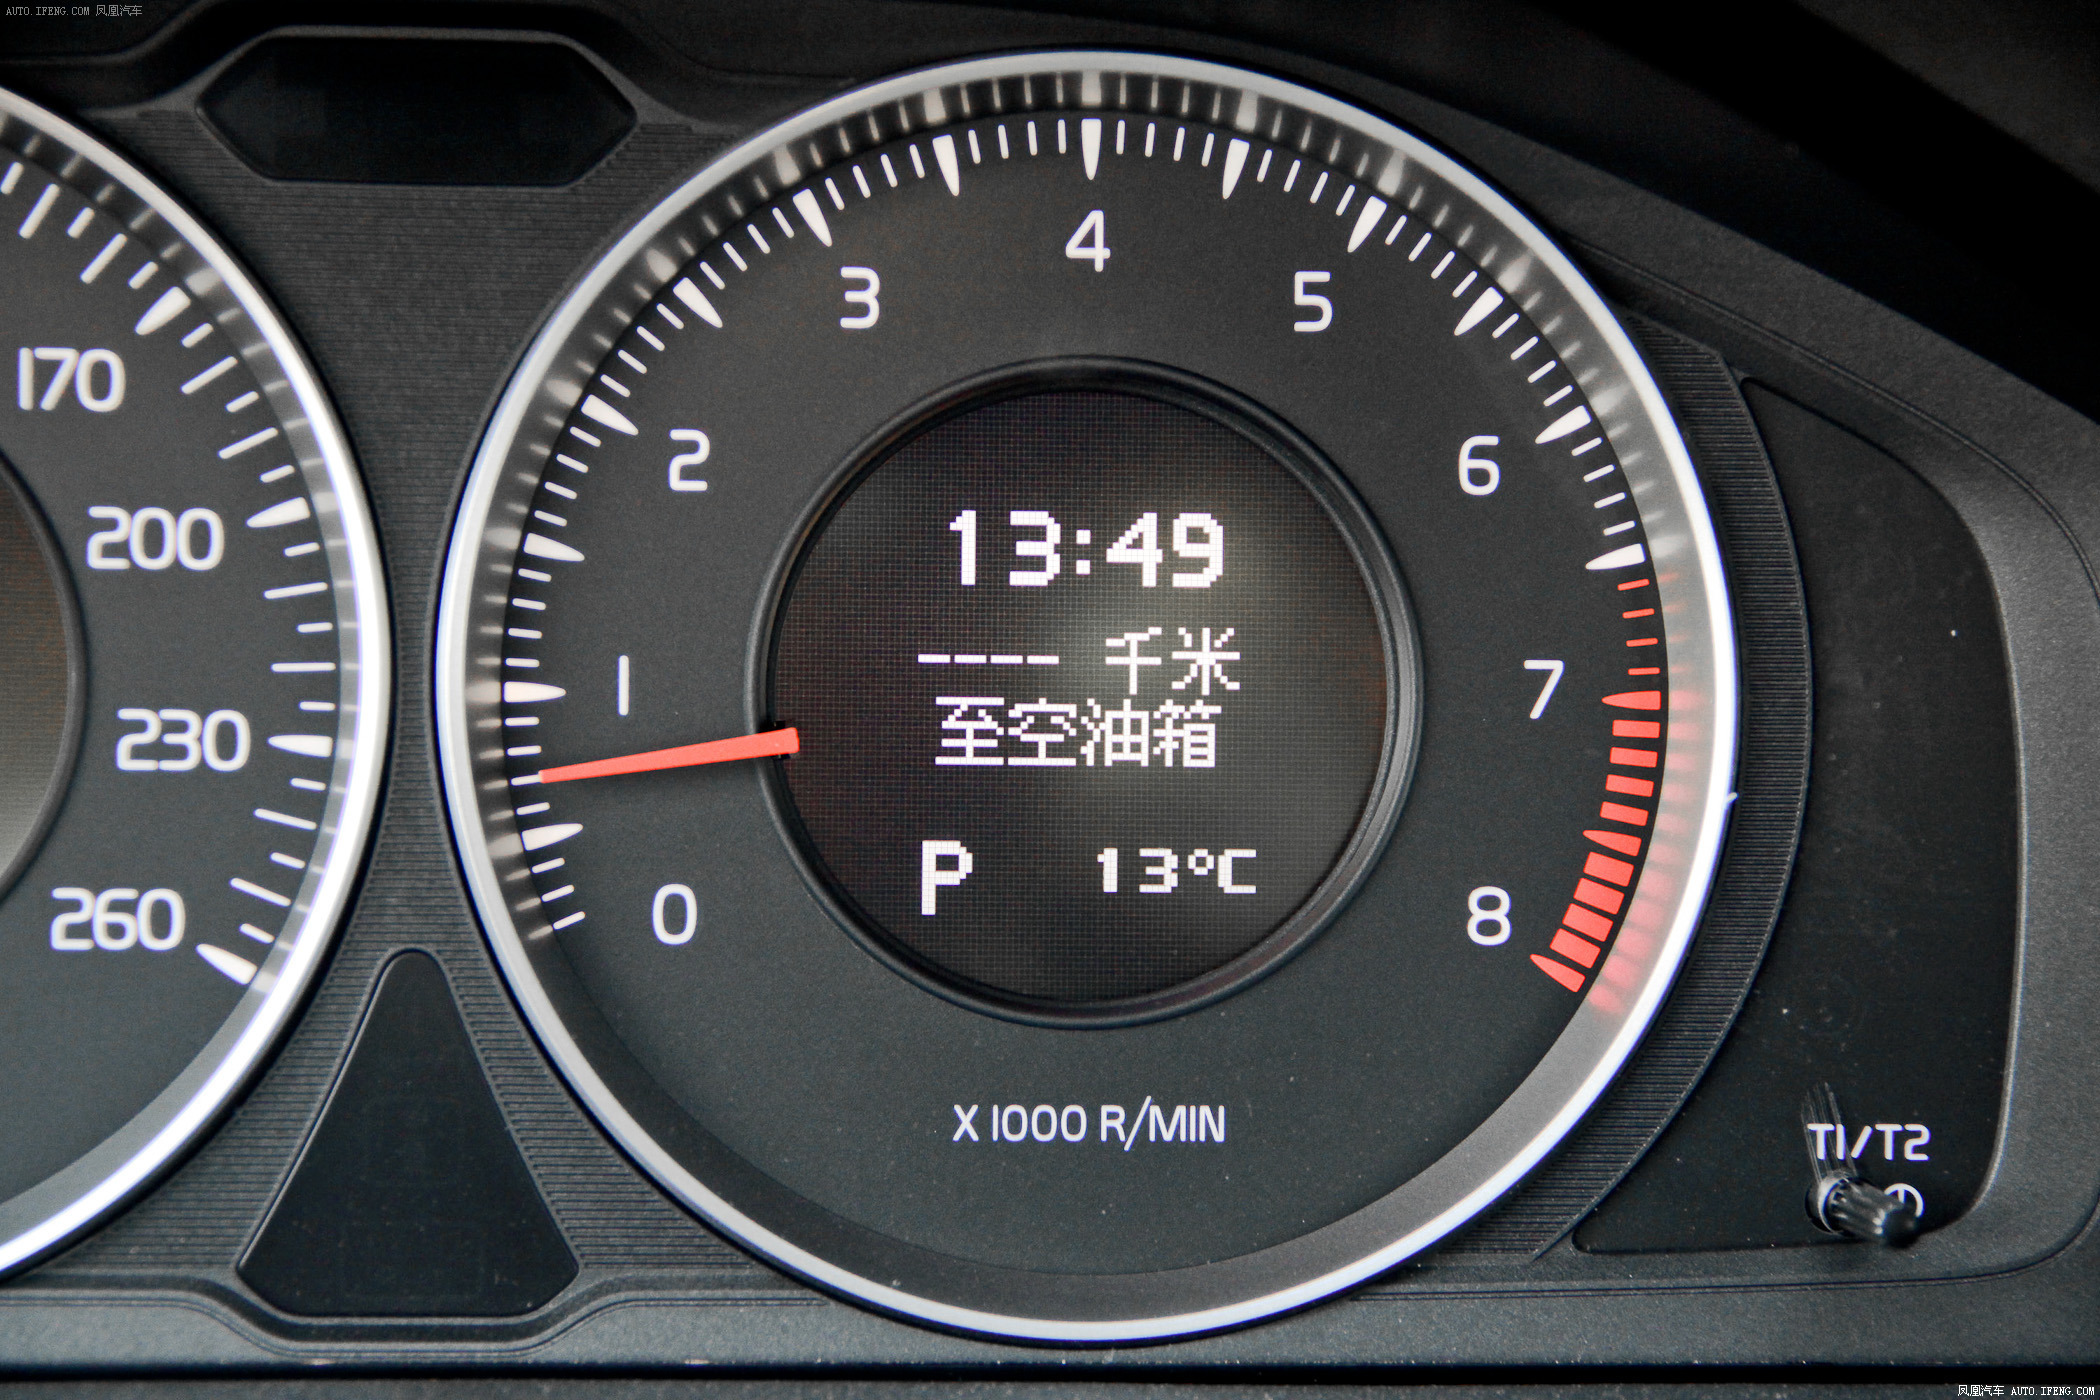 s60_沃尔沃_新车图鉴_2009上海车展